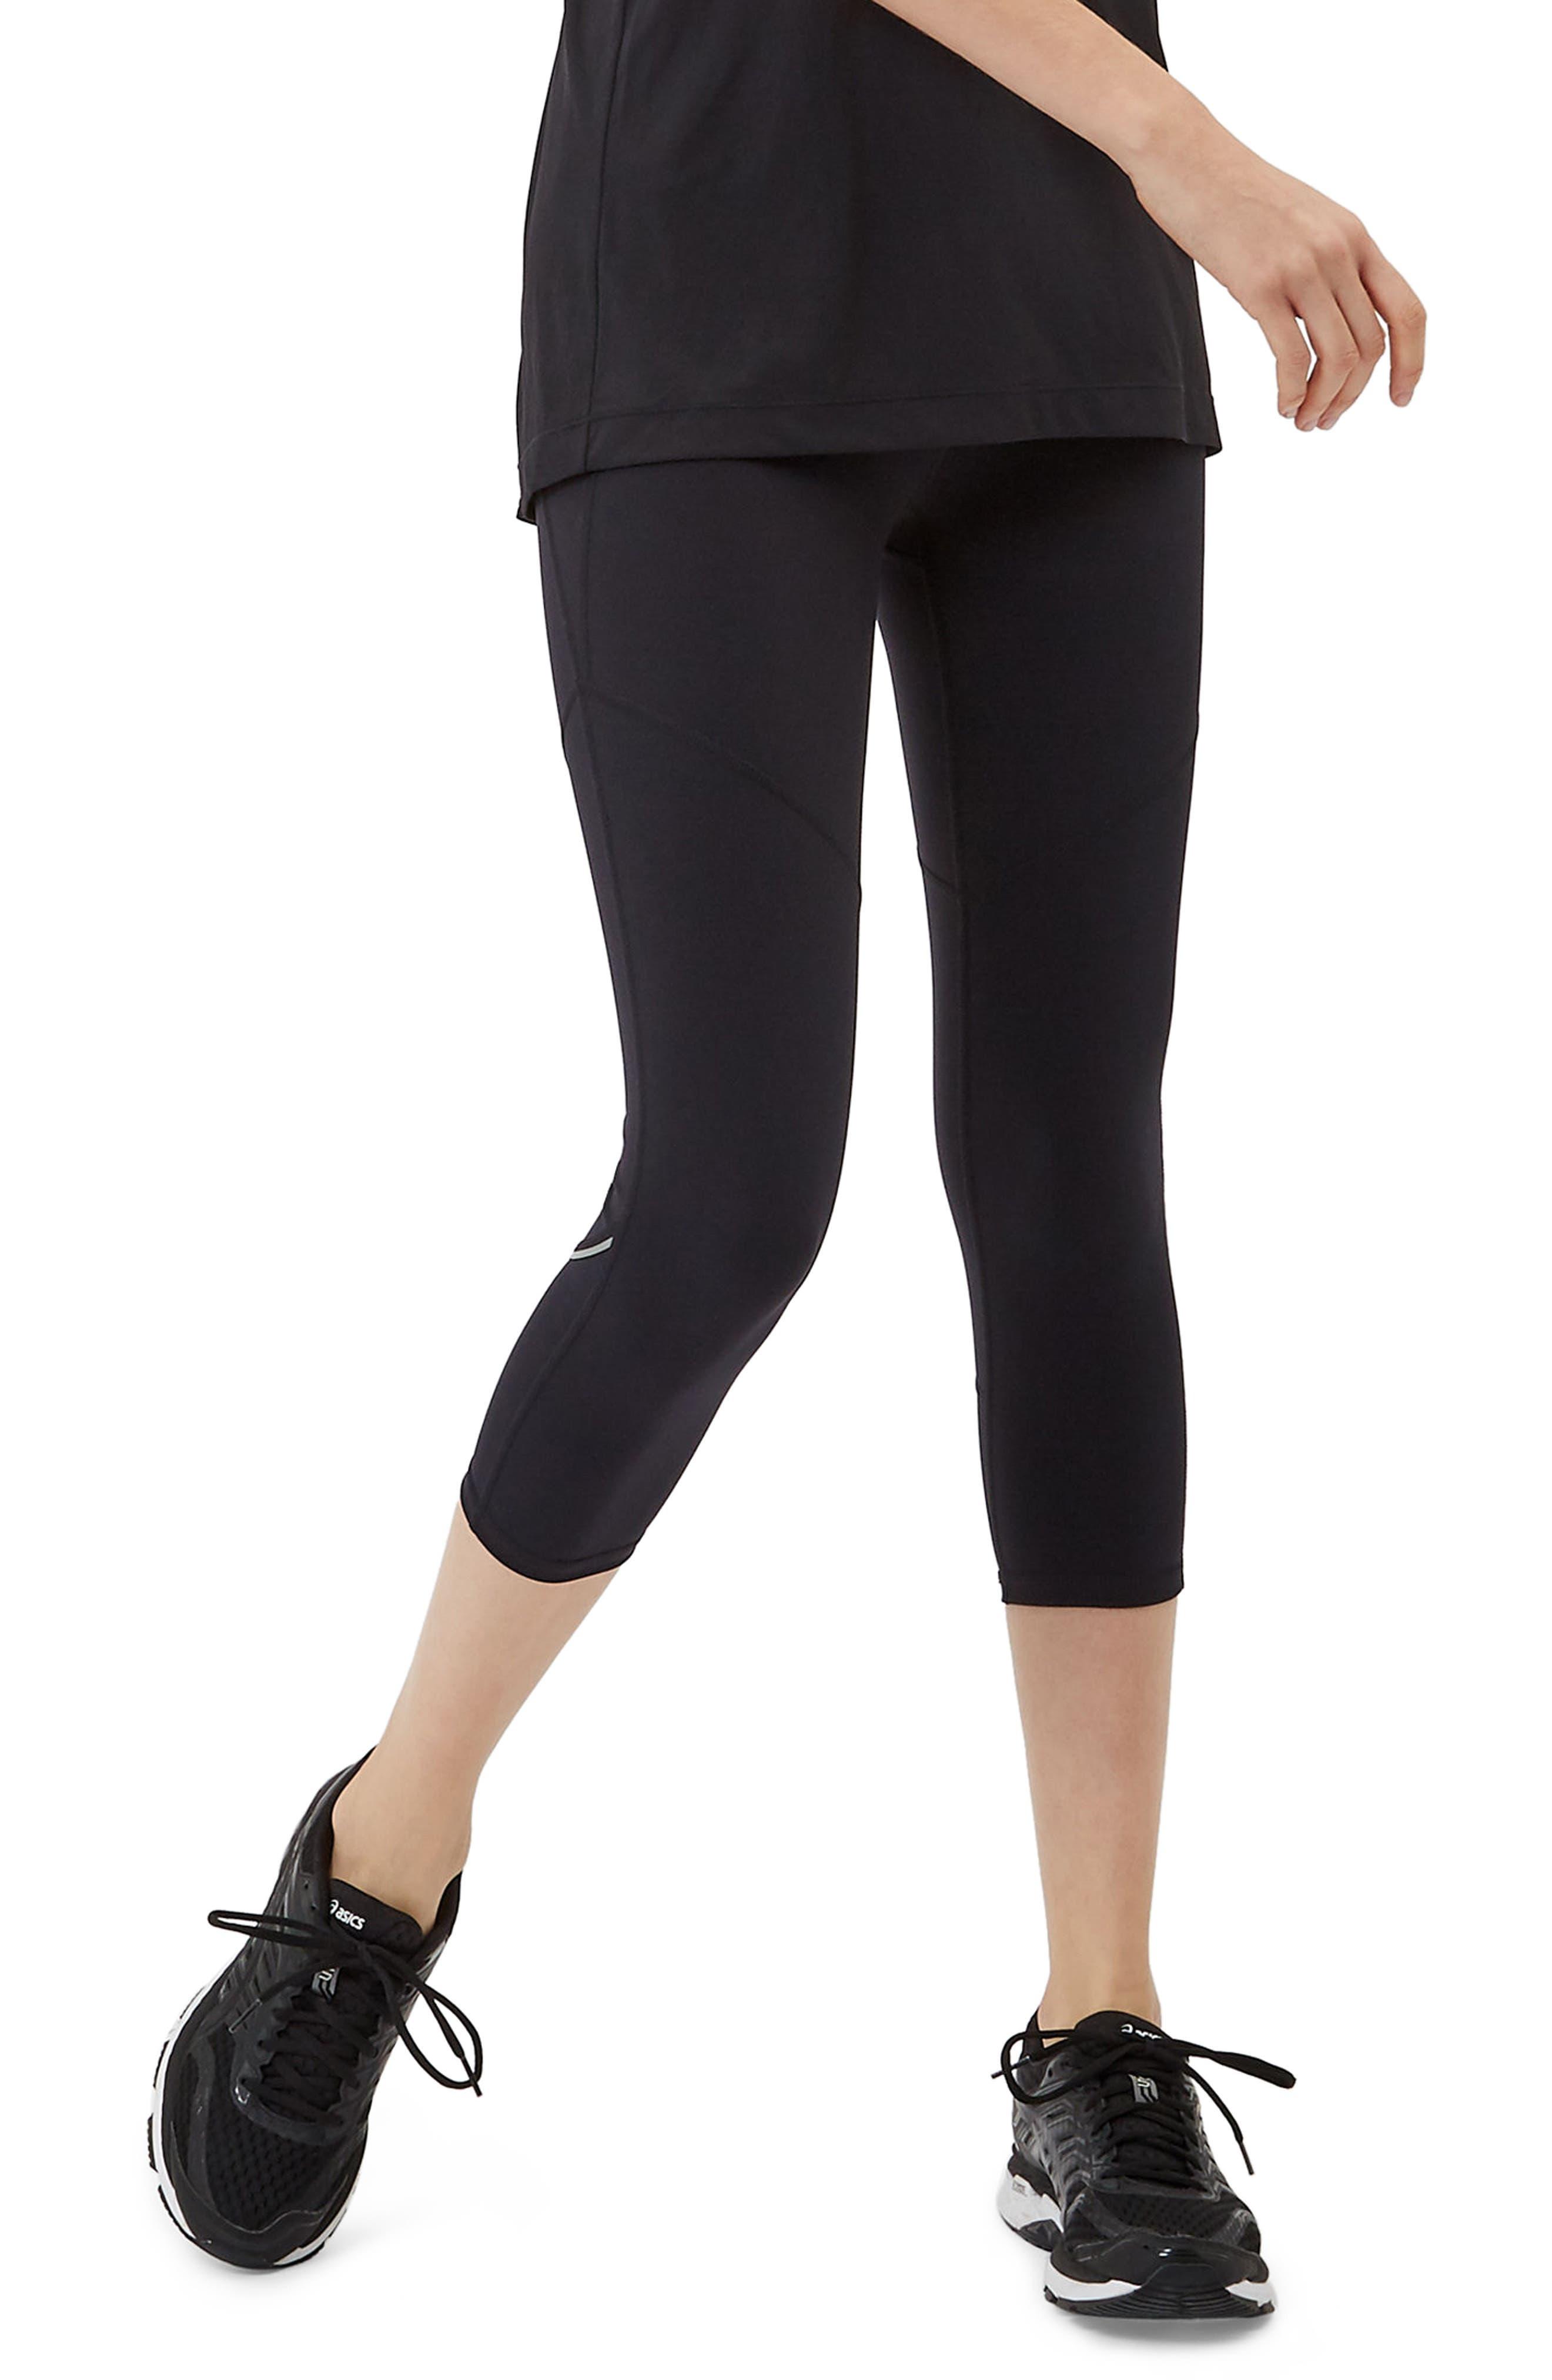 SWEATY BETTY, Power Workout Crop Leggings, Main thumbnail 1, color, BLACK